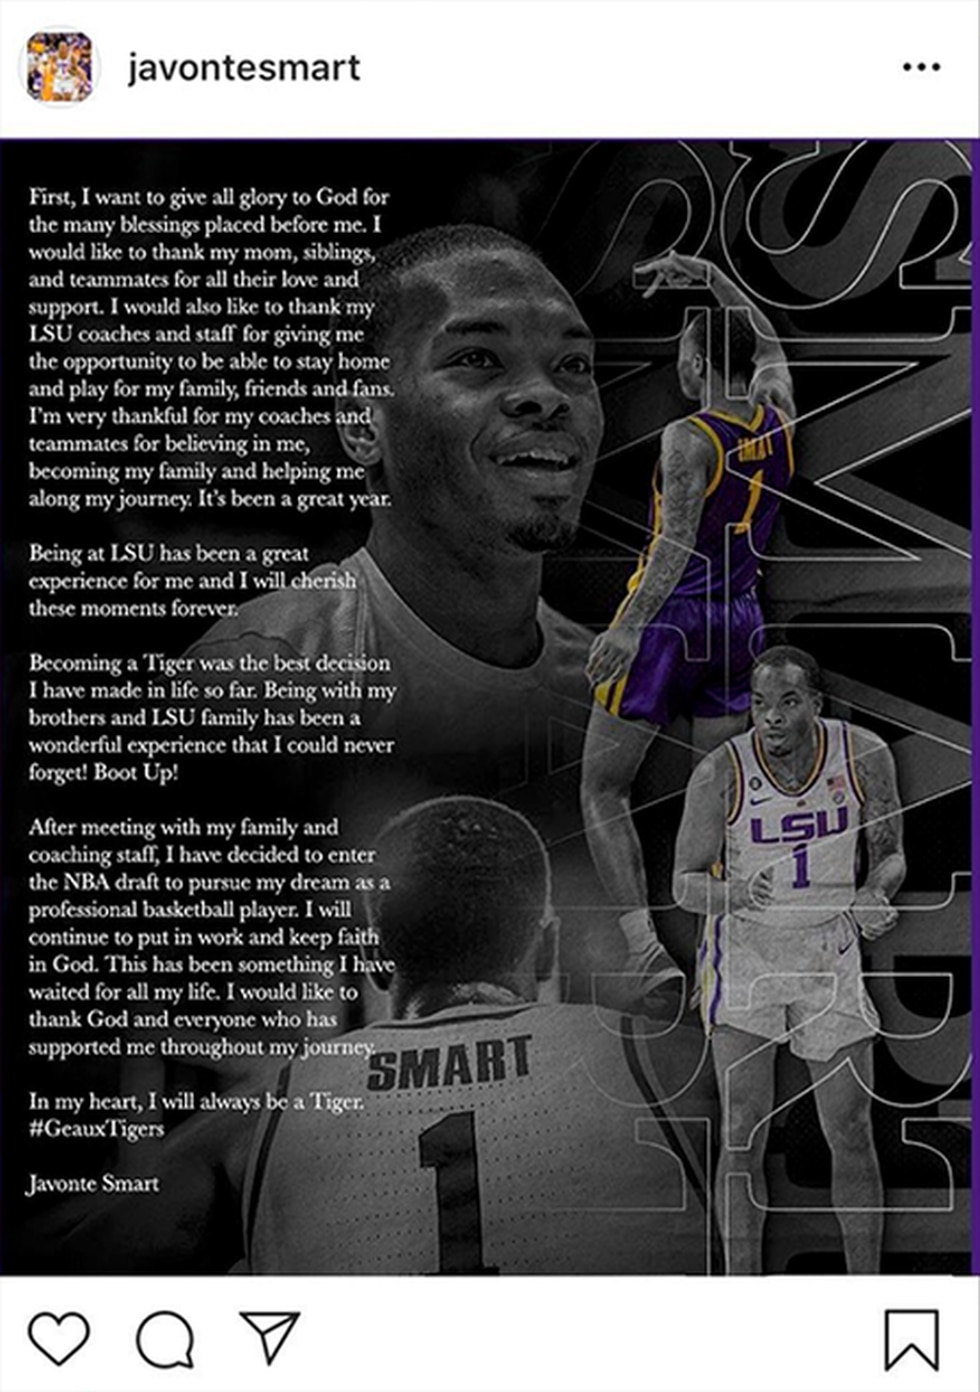 Javonte Smart declared for the NBA Draft on Instagram (Source: Instagram.com/JavonteSmart)